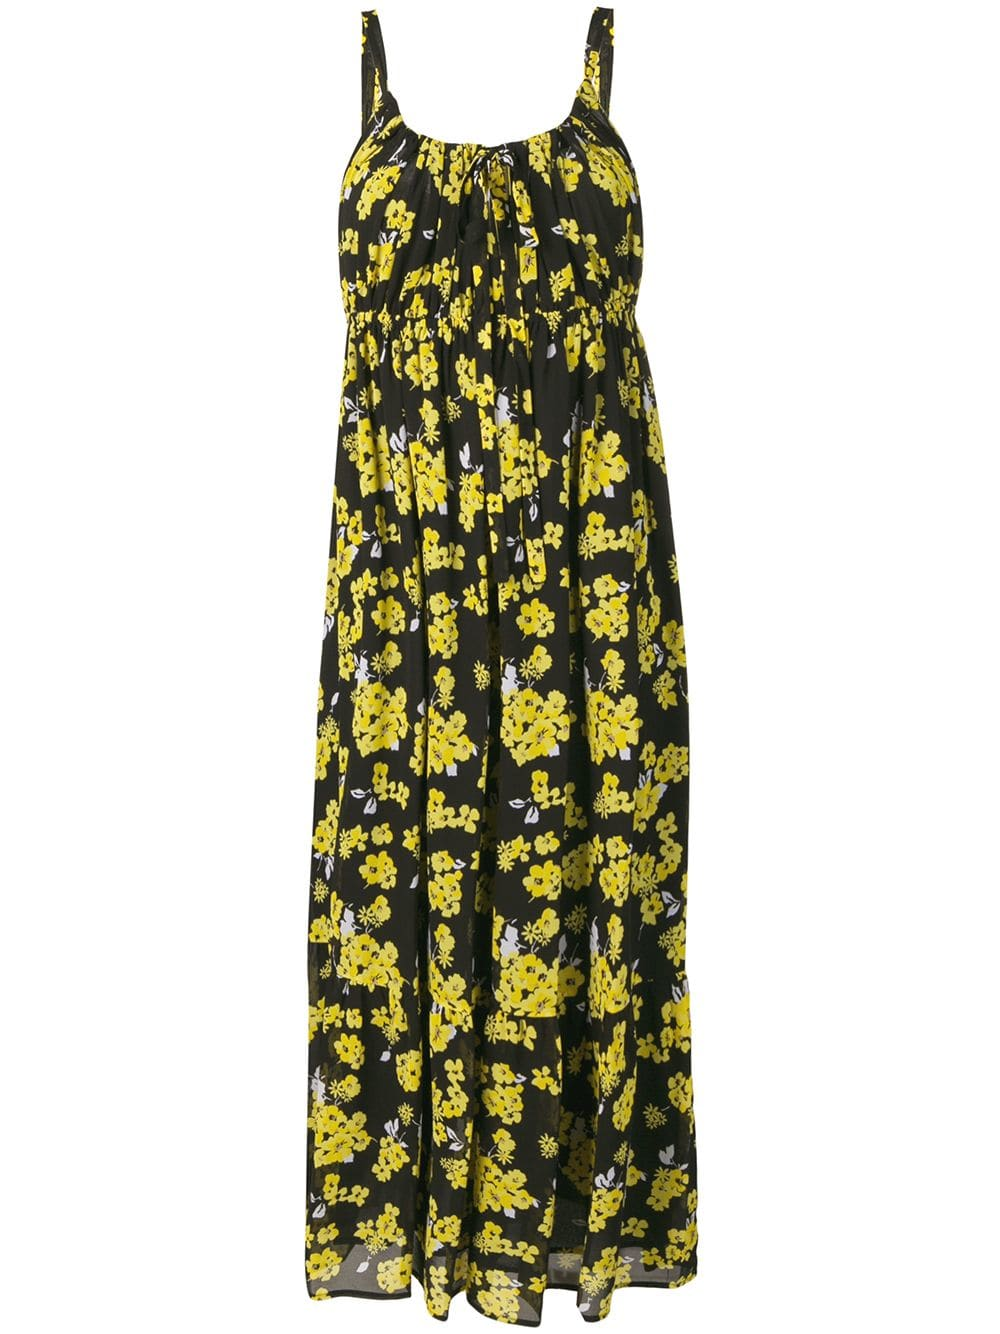 Michael Kors Flower Dress